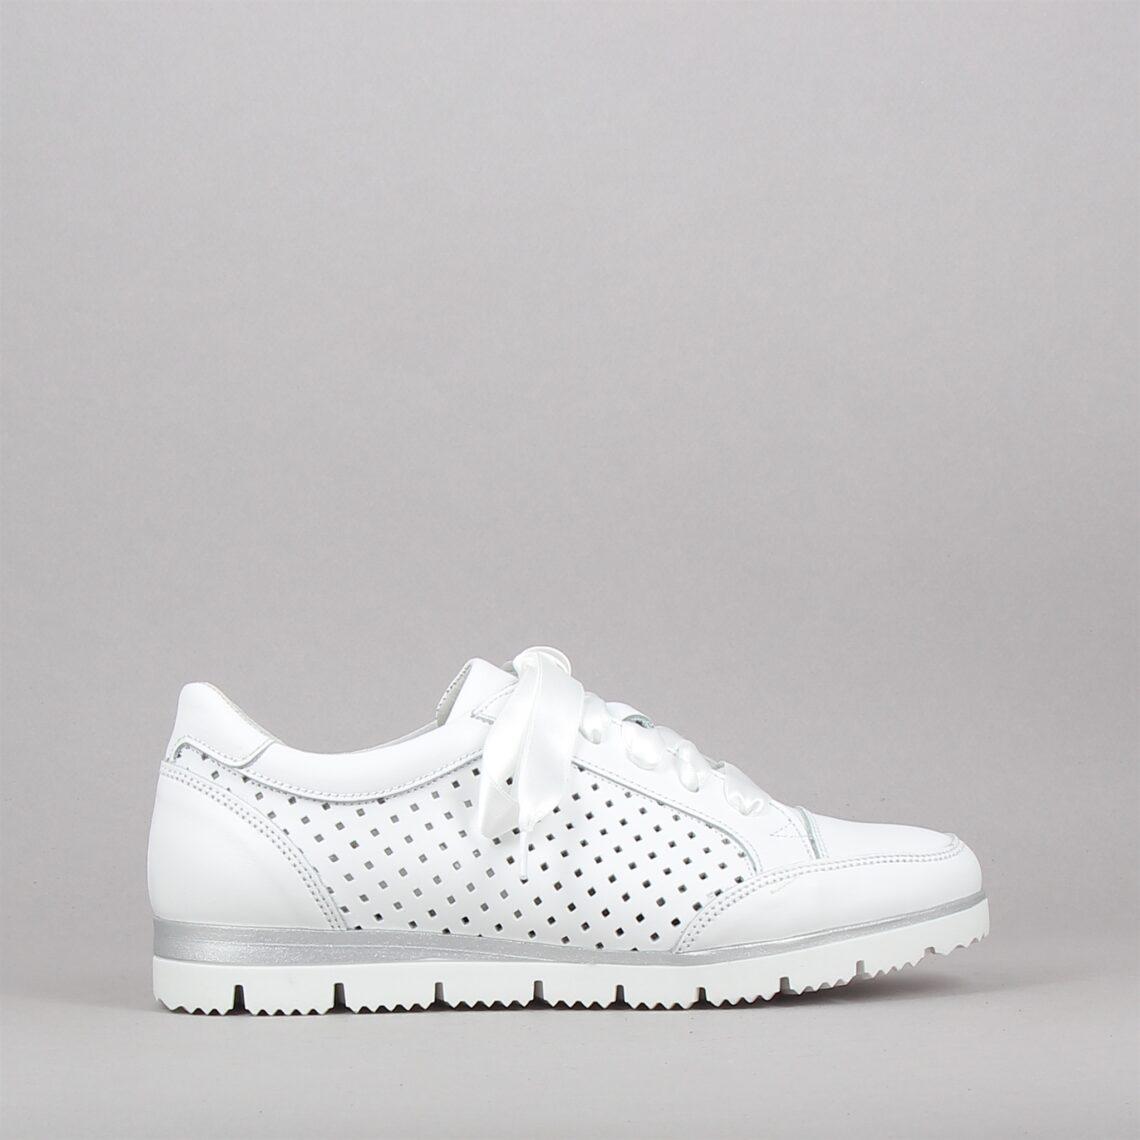 3110-blanc-170754050-0.jpg